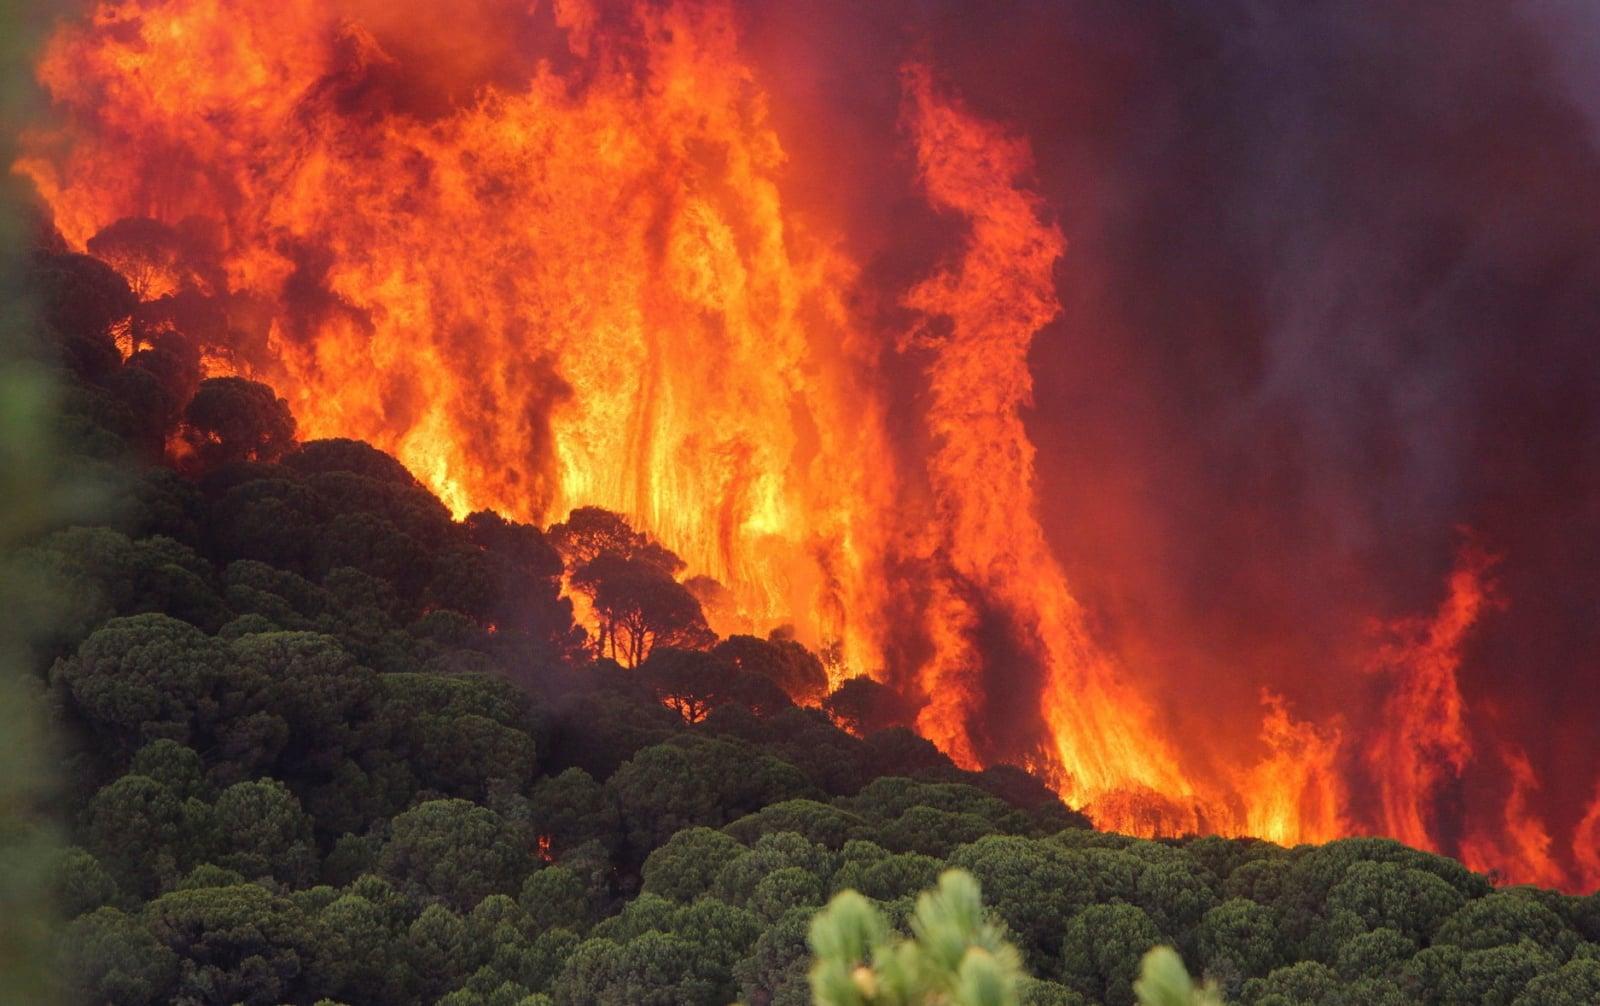 Pożar w Nerva, Huelva, Andaluzja, południowa Hiszpania, fot. EPA/JULIAN PEREZ